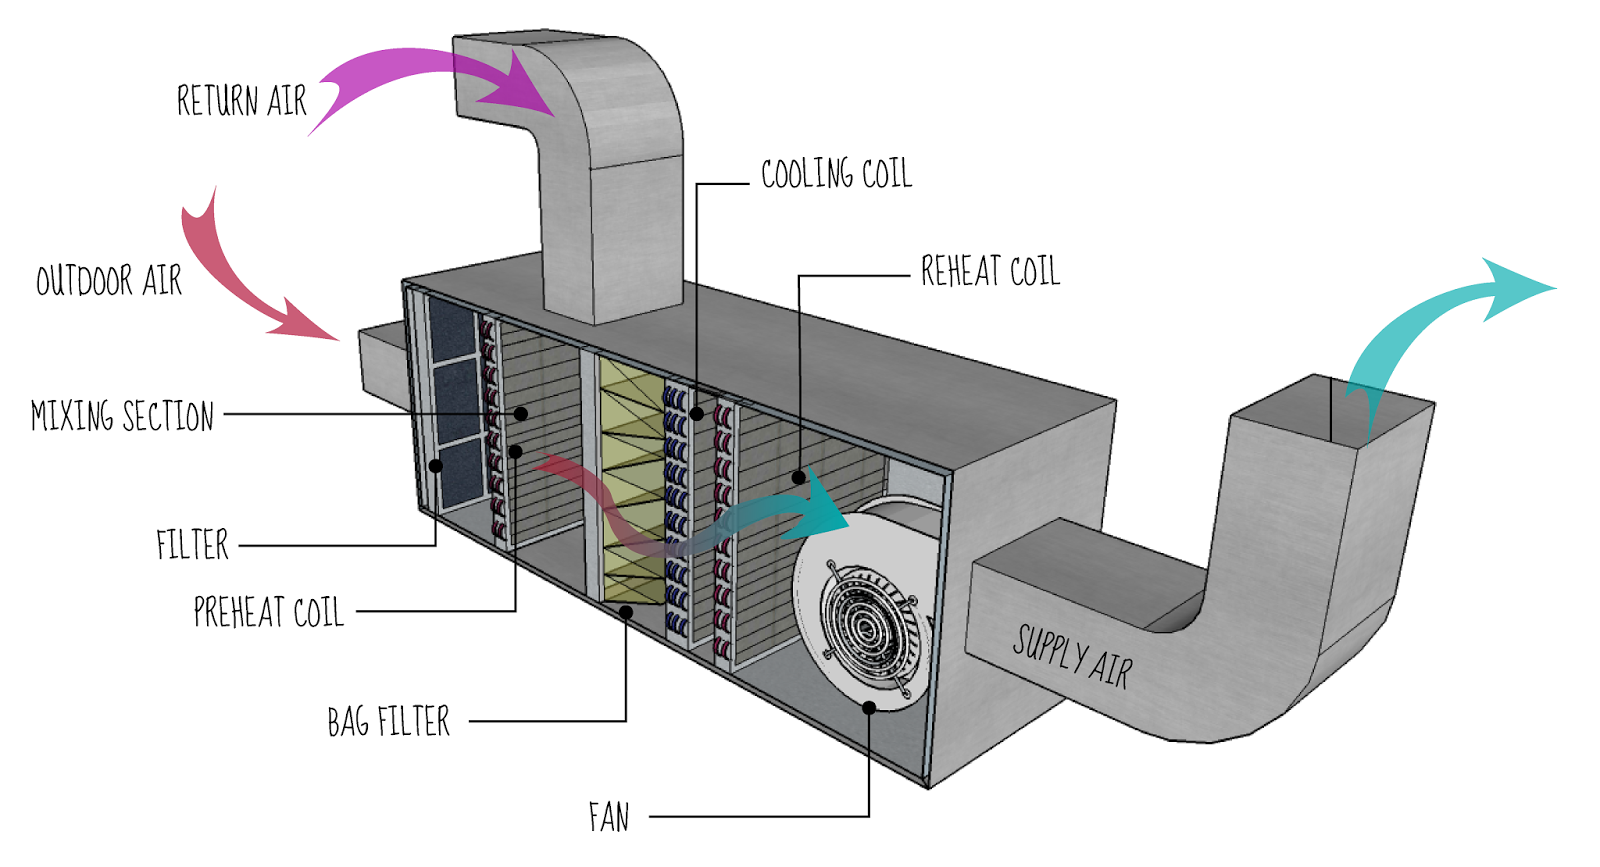 small resolution of basic principles of a hvac system engineering updates rh teenknowlege blogspot com commercial hvac diagram hvac plenum diagram